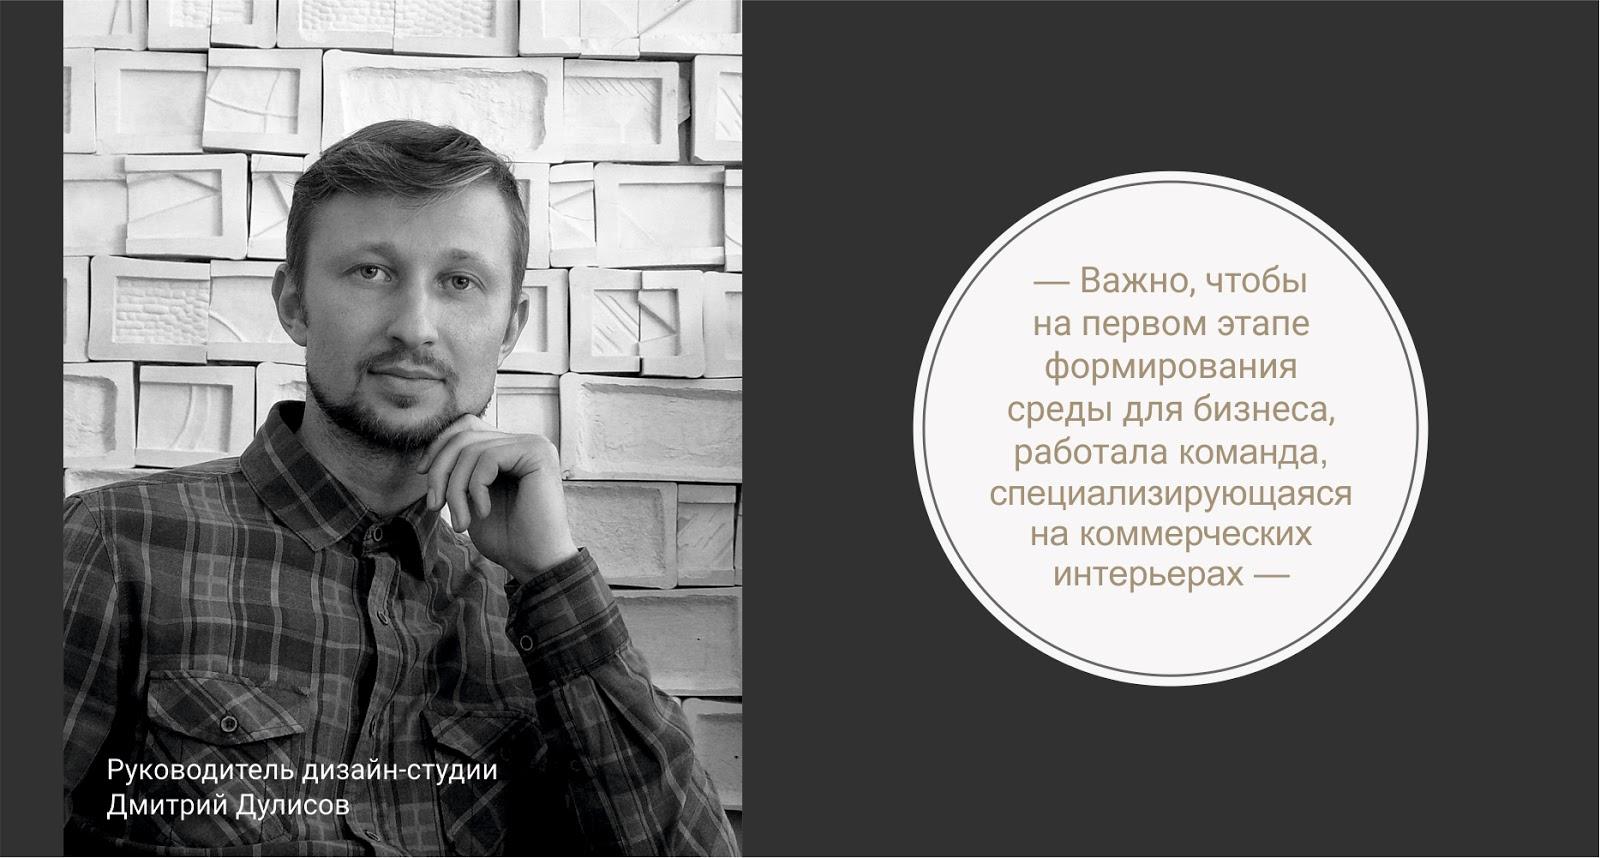 Дмитрий Дулисов Студия дизайна интерьеров Екатеринбург DULISOV design studio interior